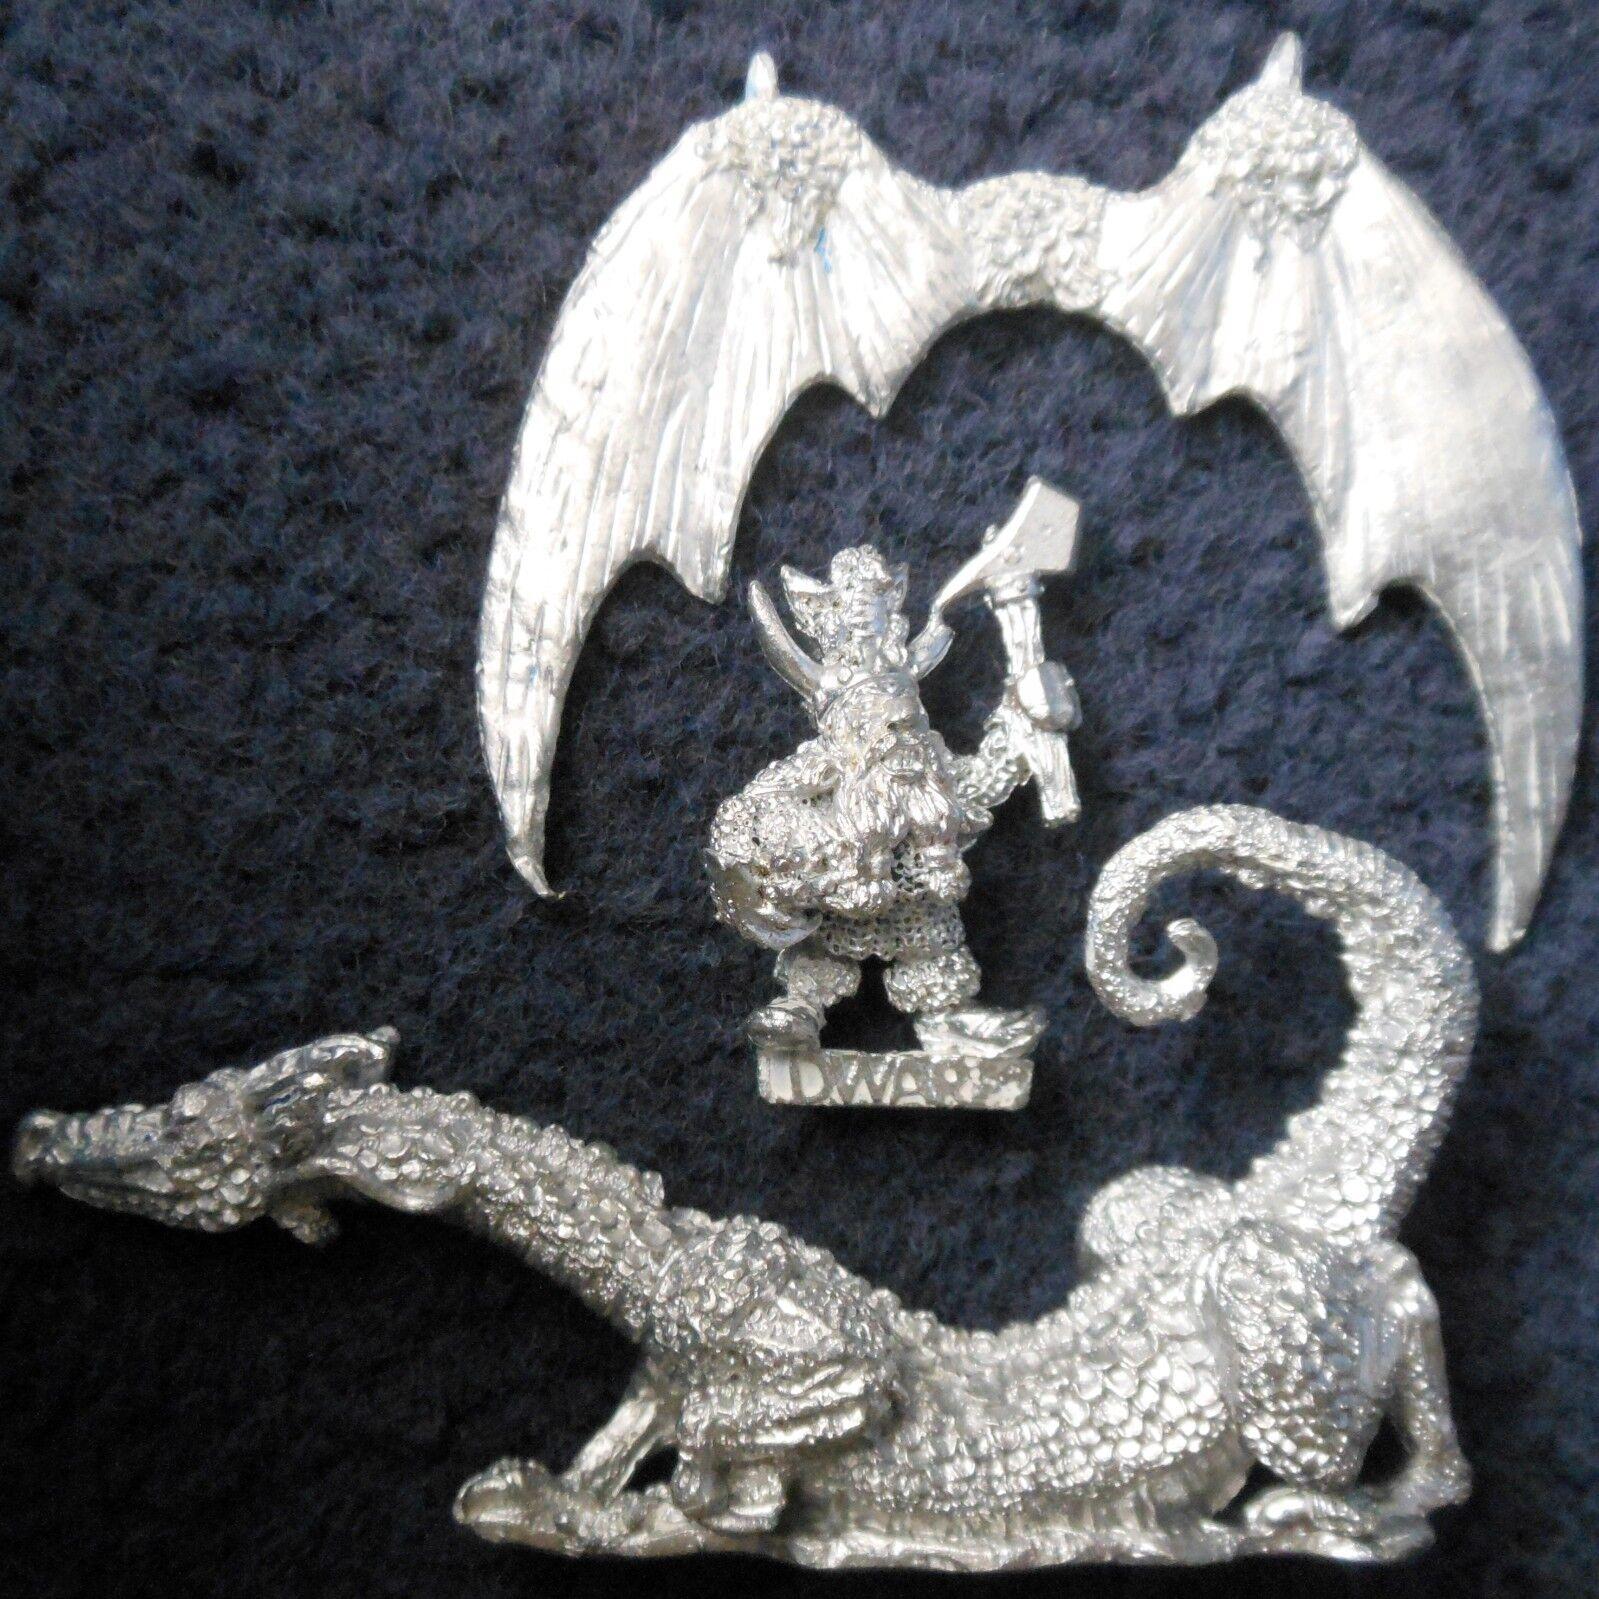 1987 DRAG3 Green Dungeons & Dragons Games Workshop Citadel Warhammer AD&D Dwarf